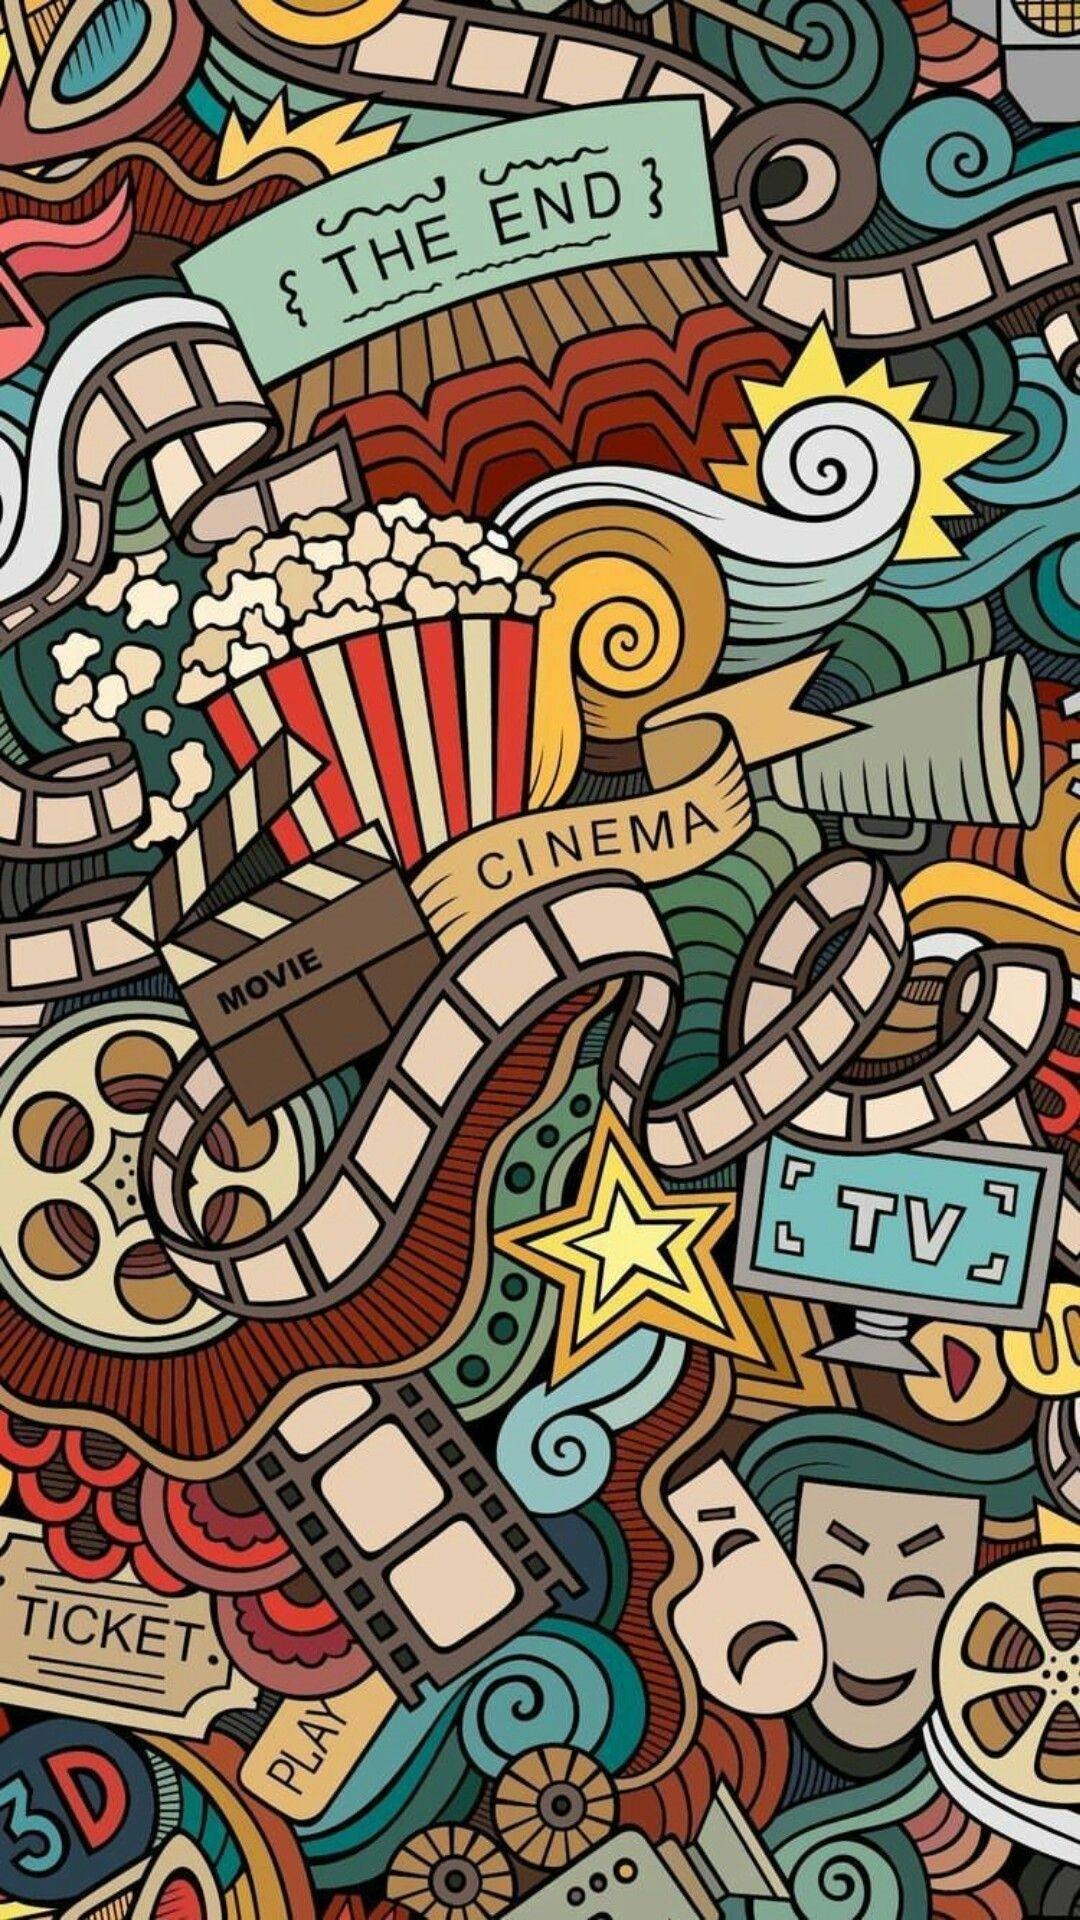 Art screensaver wallpaper